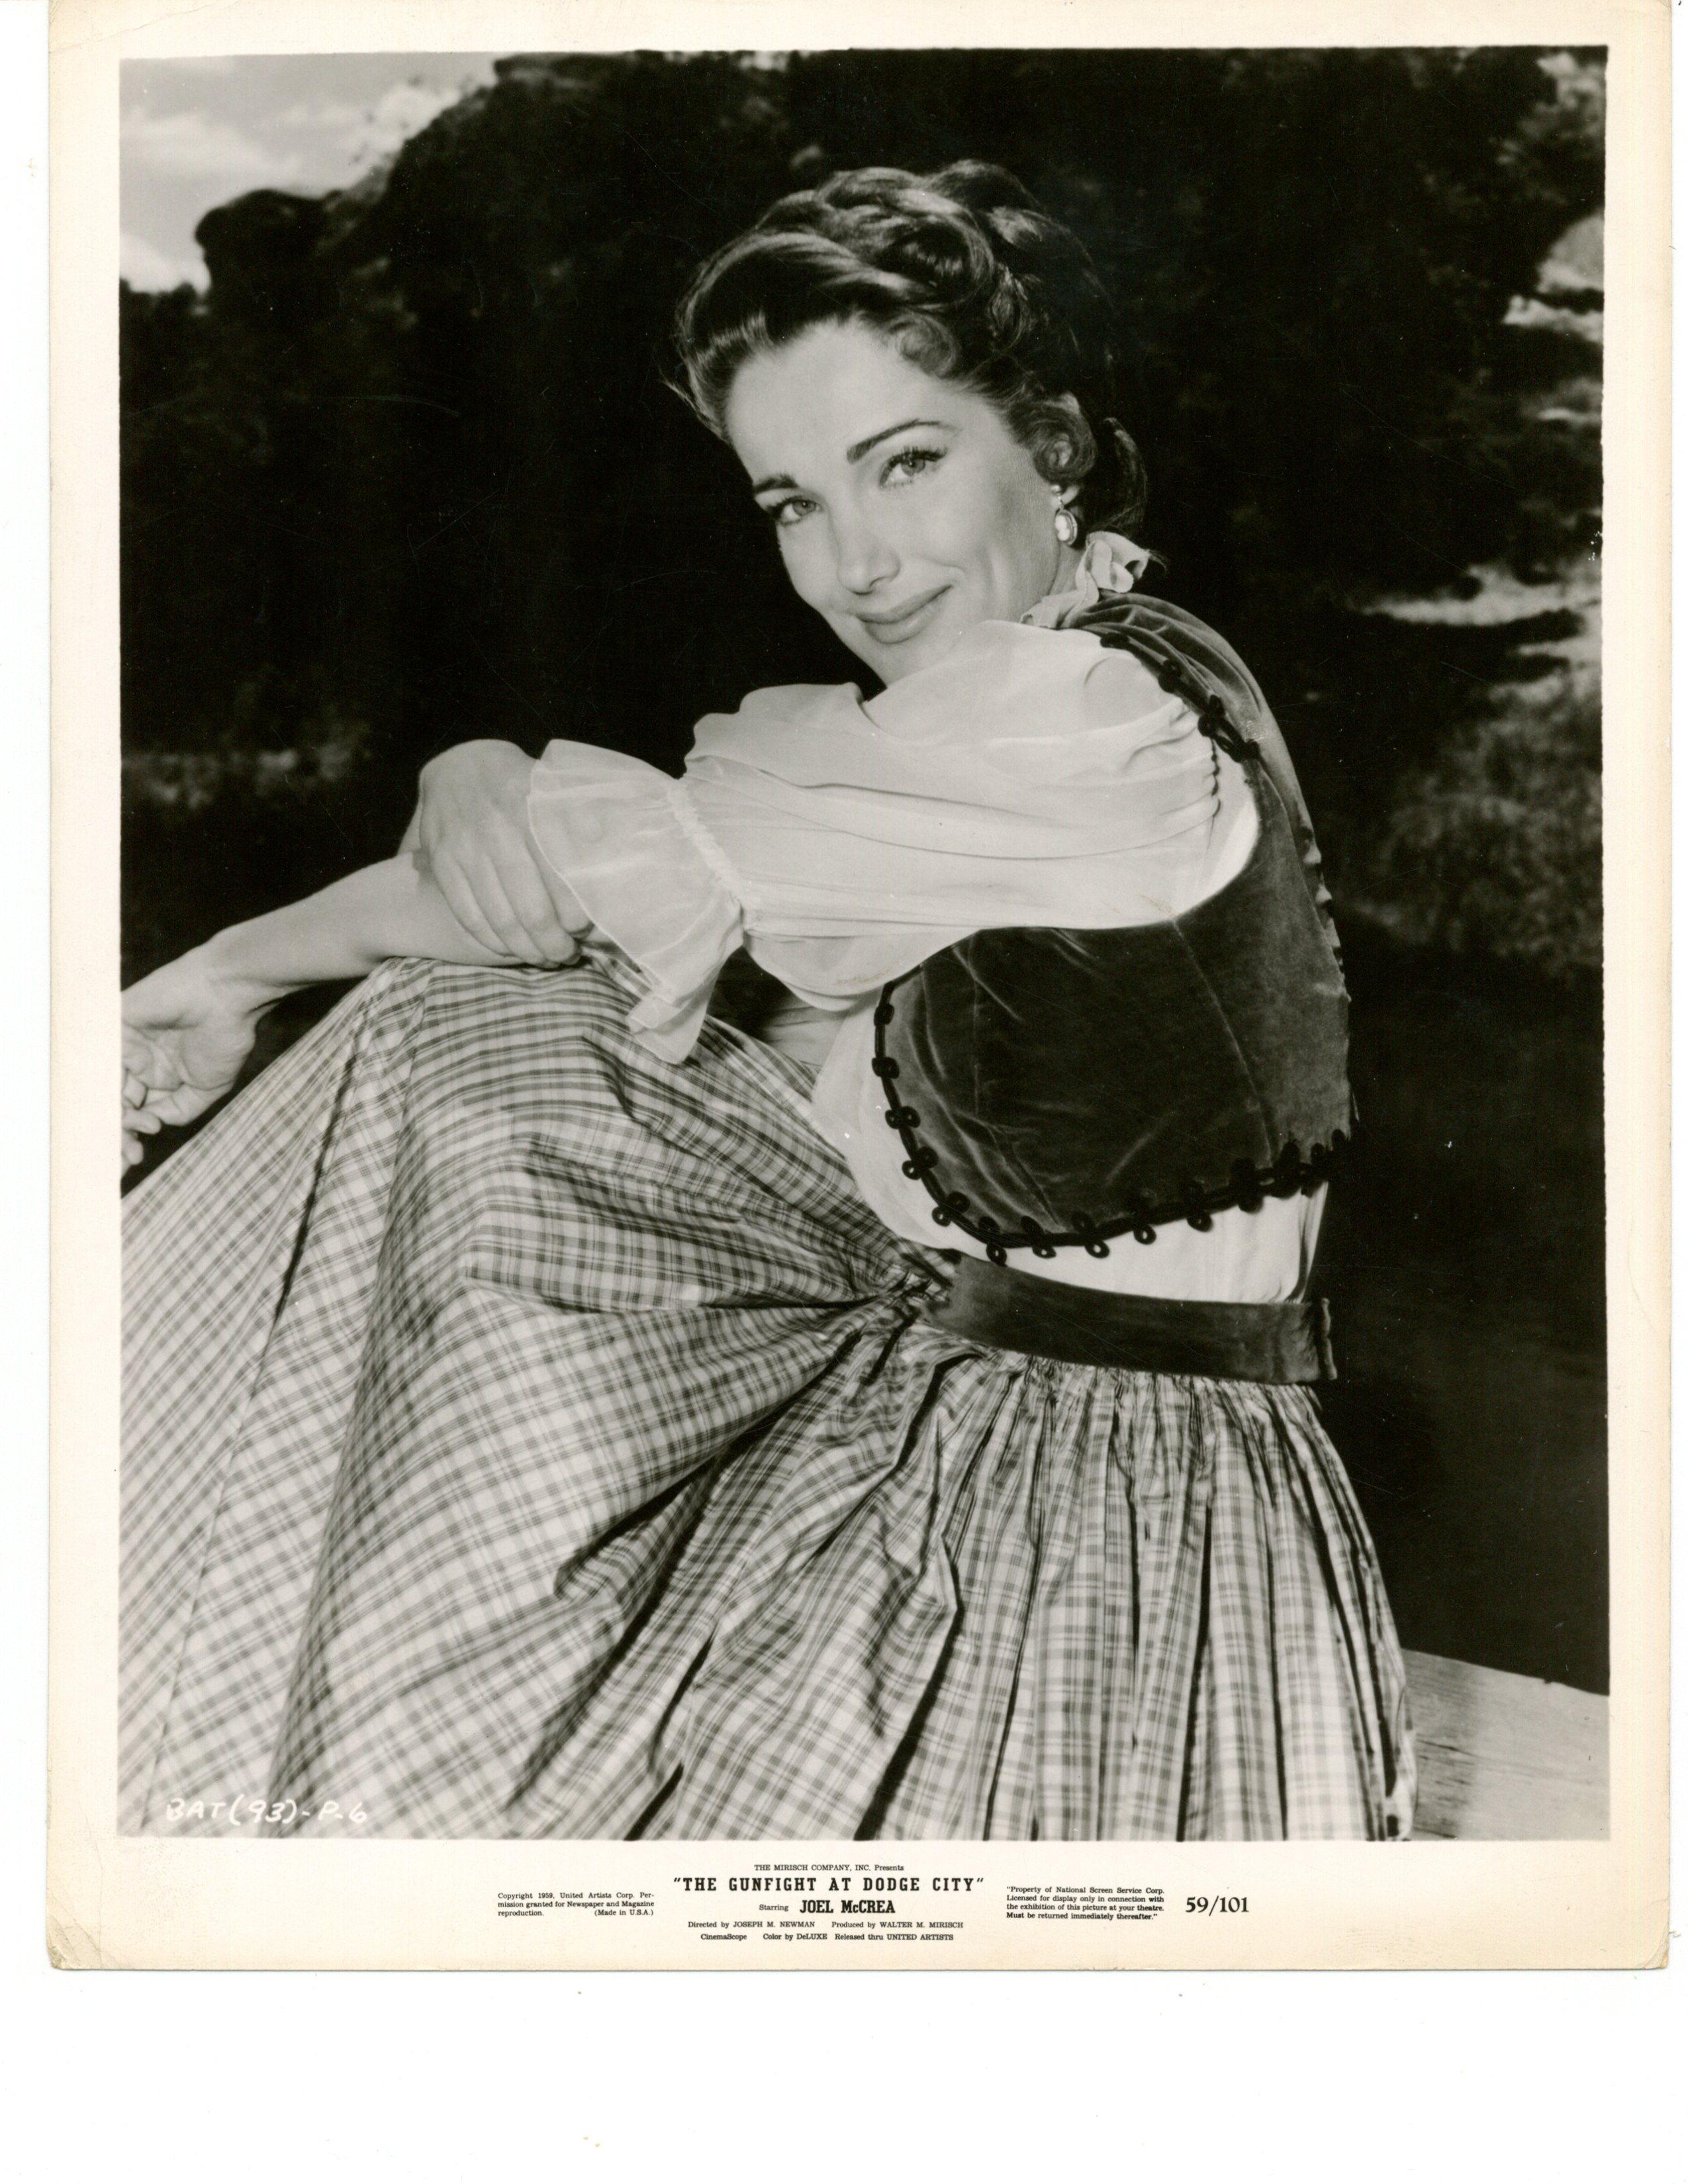 Julie Adams in The Gunfight at Dodge City (1959)